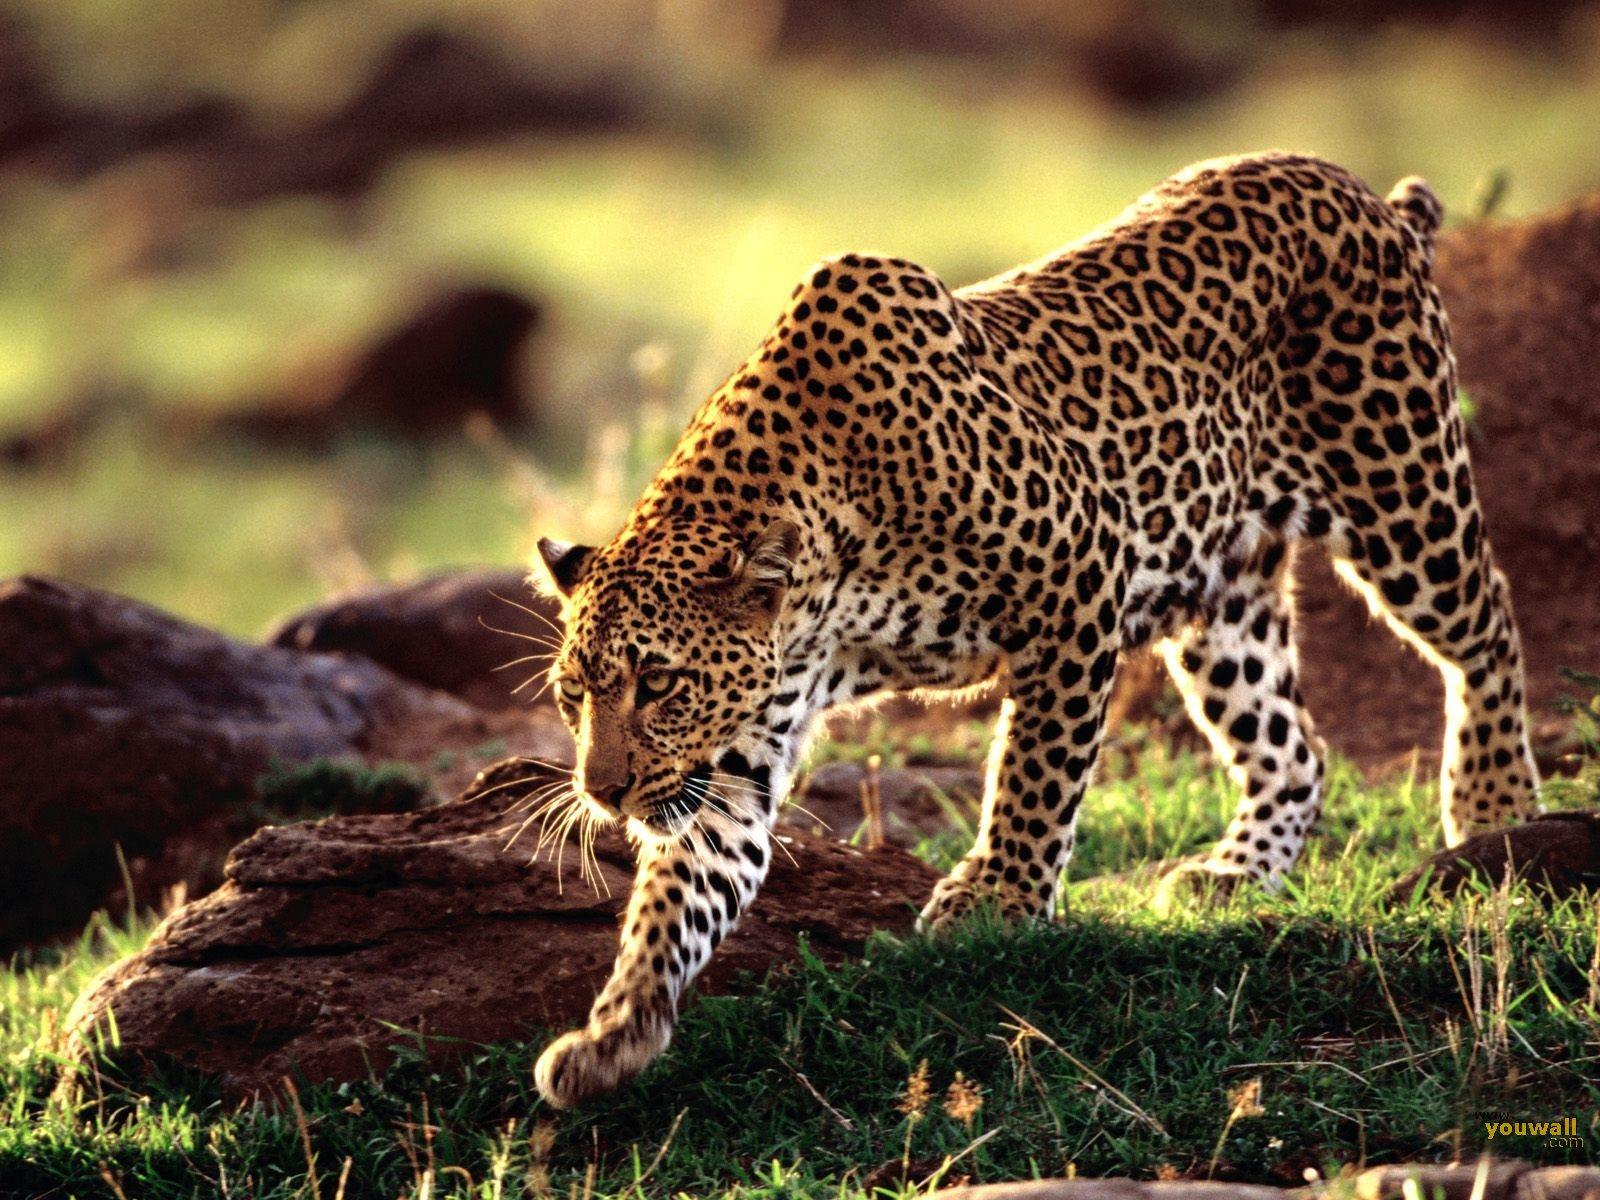 http://3.bp.blogspot.com/-1L4XTSbw8Ek/TpdLHJLVHHI/AAAAAAAACZg/RUMEQBnNLgs/s1600/animal%25252Bwallpaper-cheetah-712417.jpg